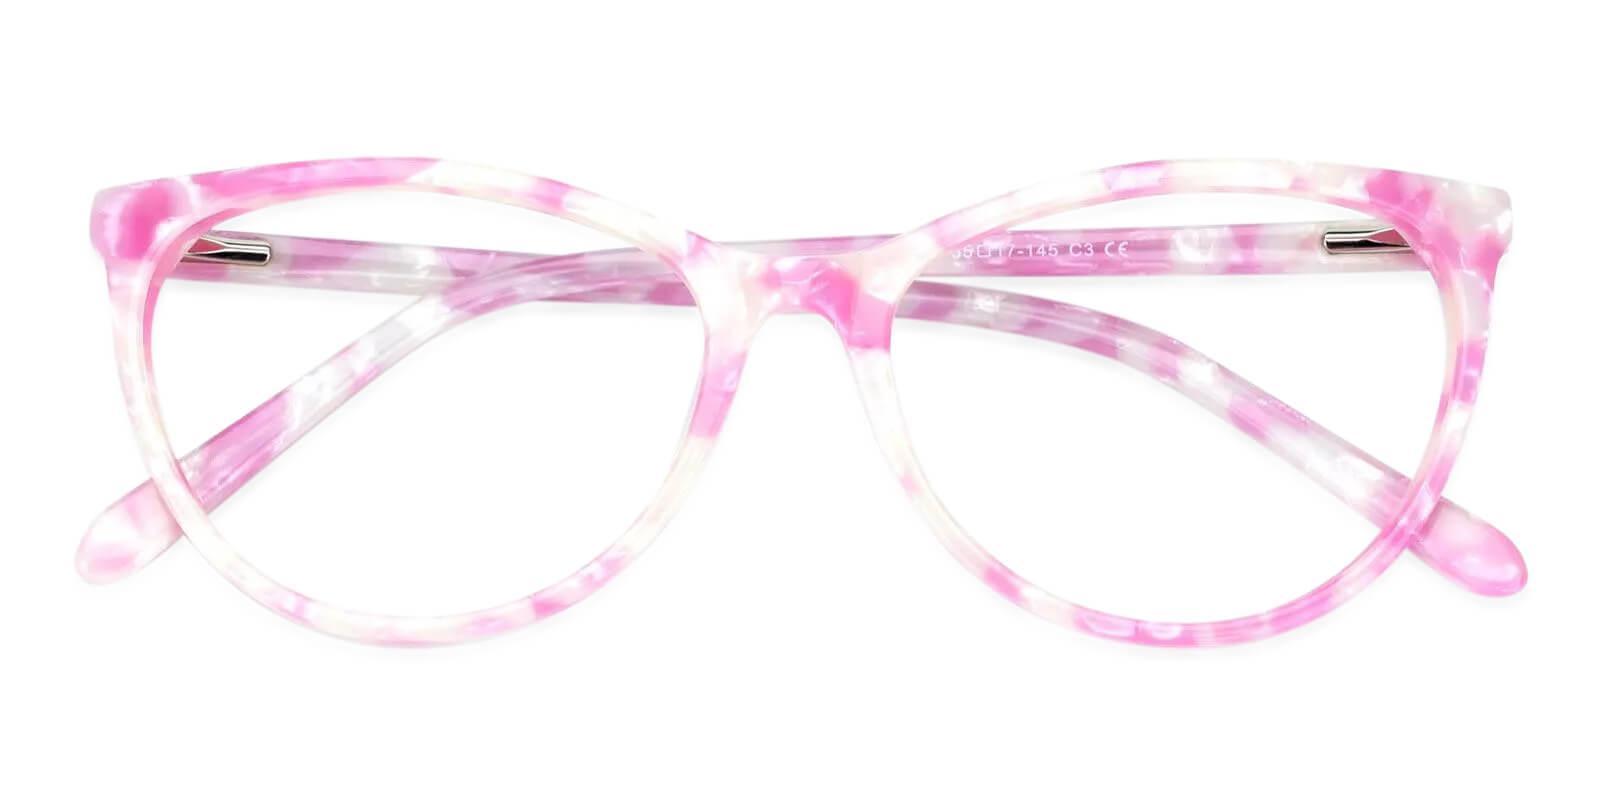 Lochlosa Pink Acetate Eyeglasses , Fashion , SpringHinges , UniversalBridgeFit Frames from ABBE Glasses